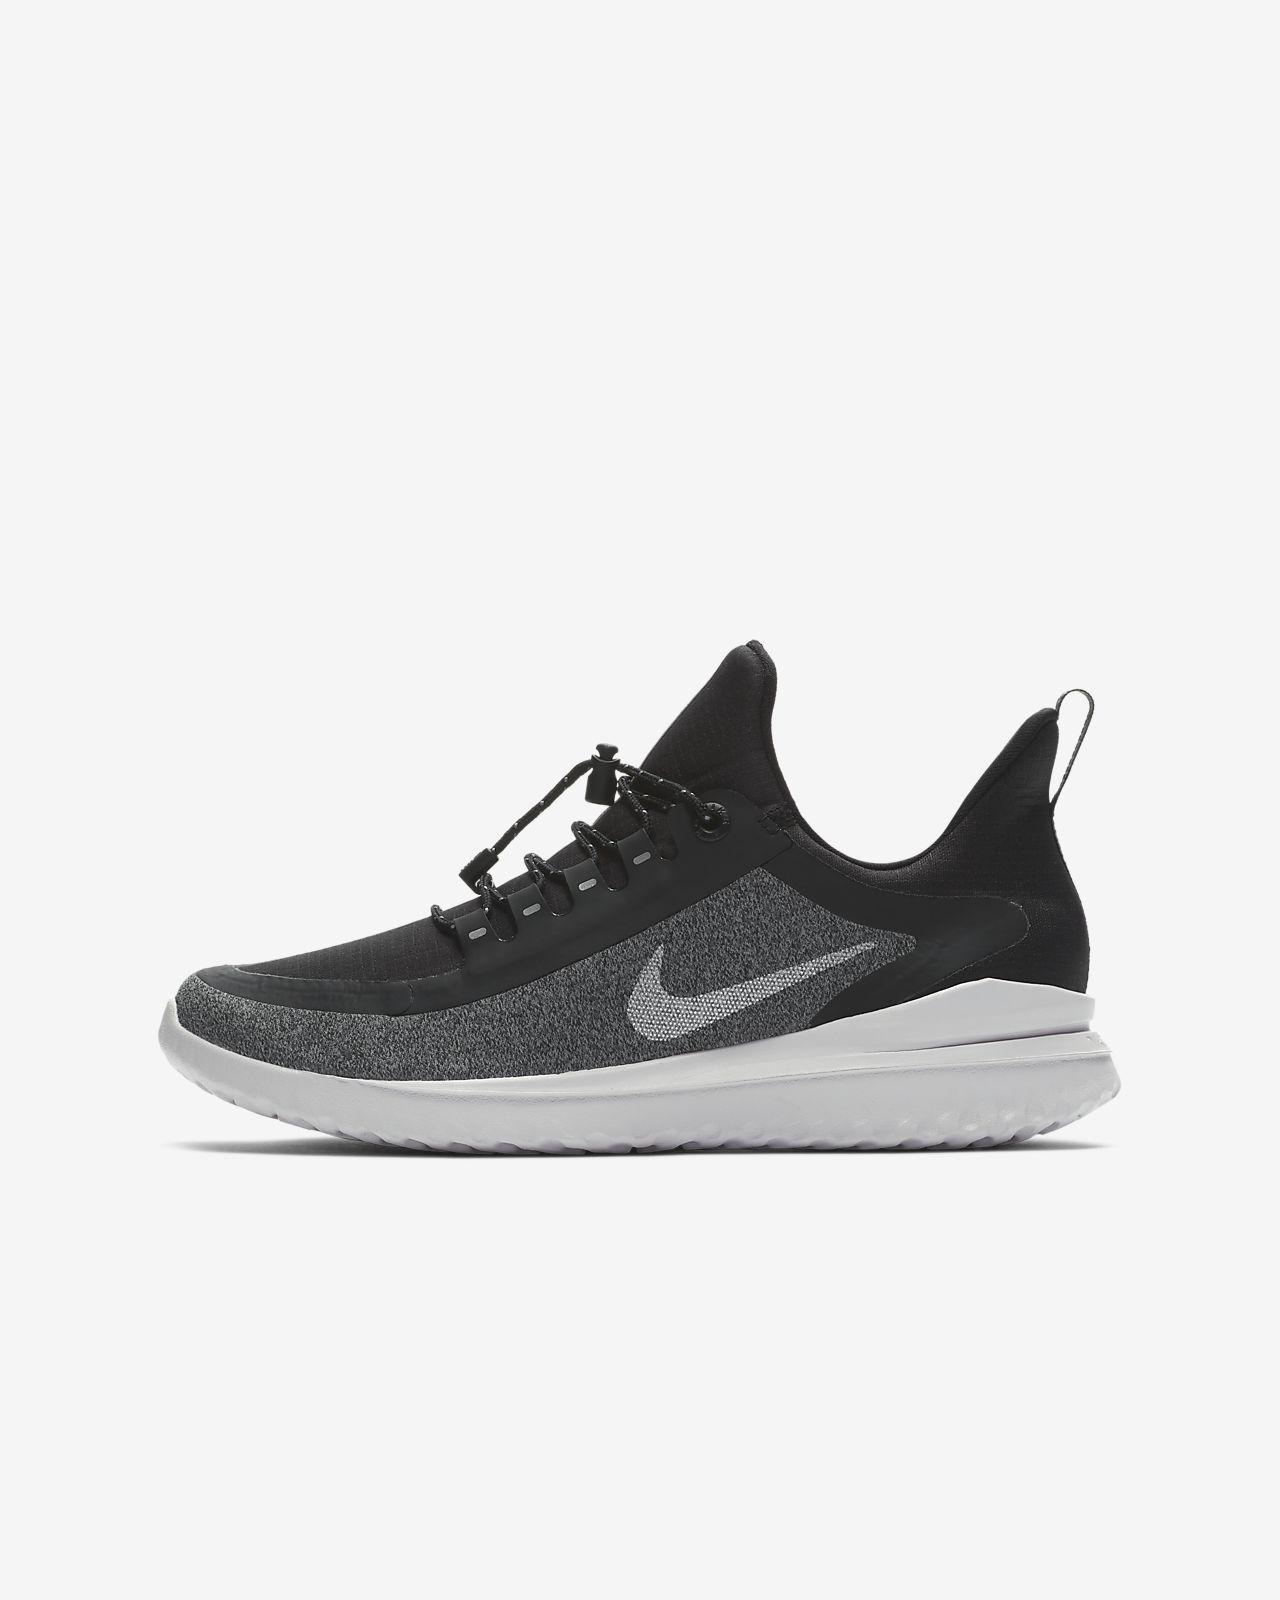 Calzado de running para niños talla grande Nike Renew Rival Shield